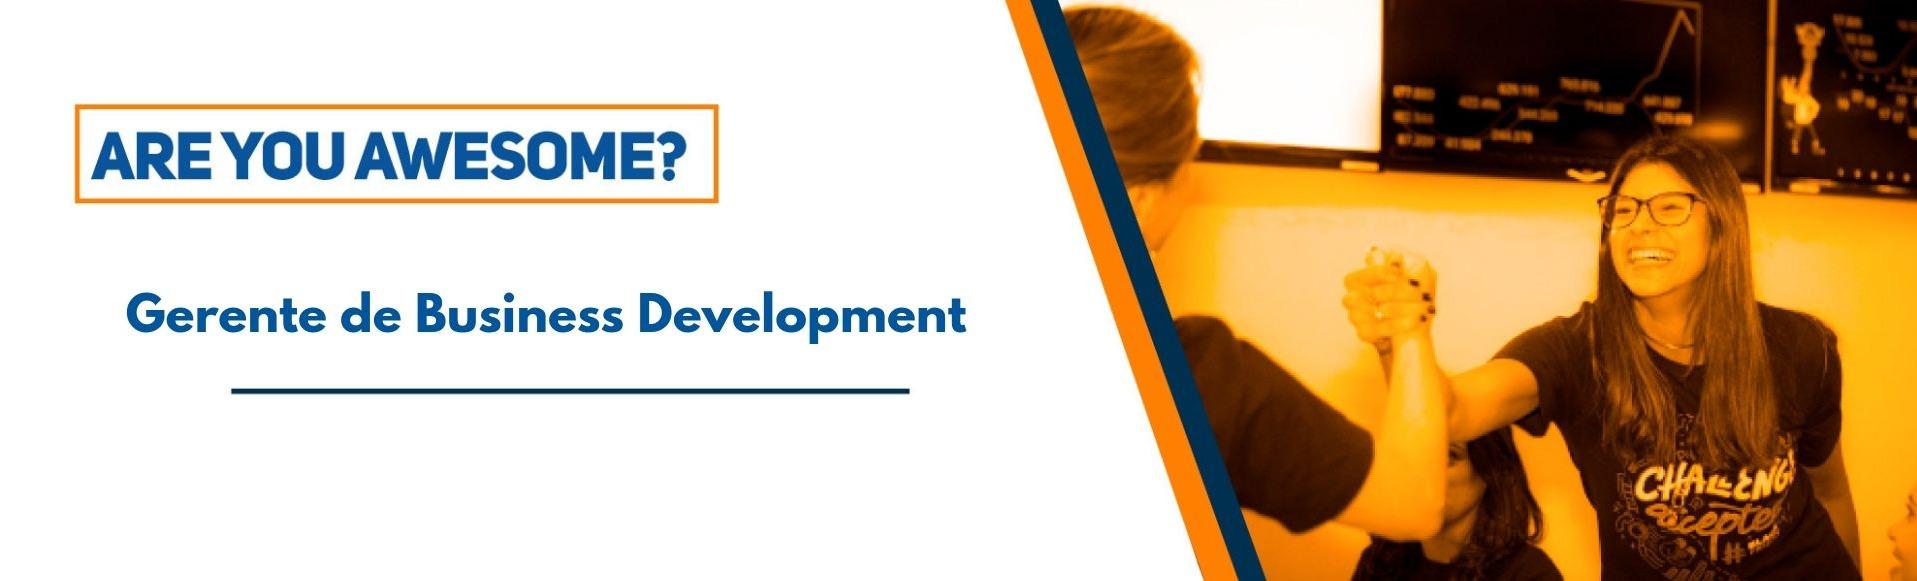 Gerente de Business Development